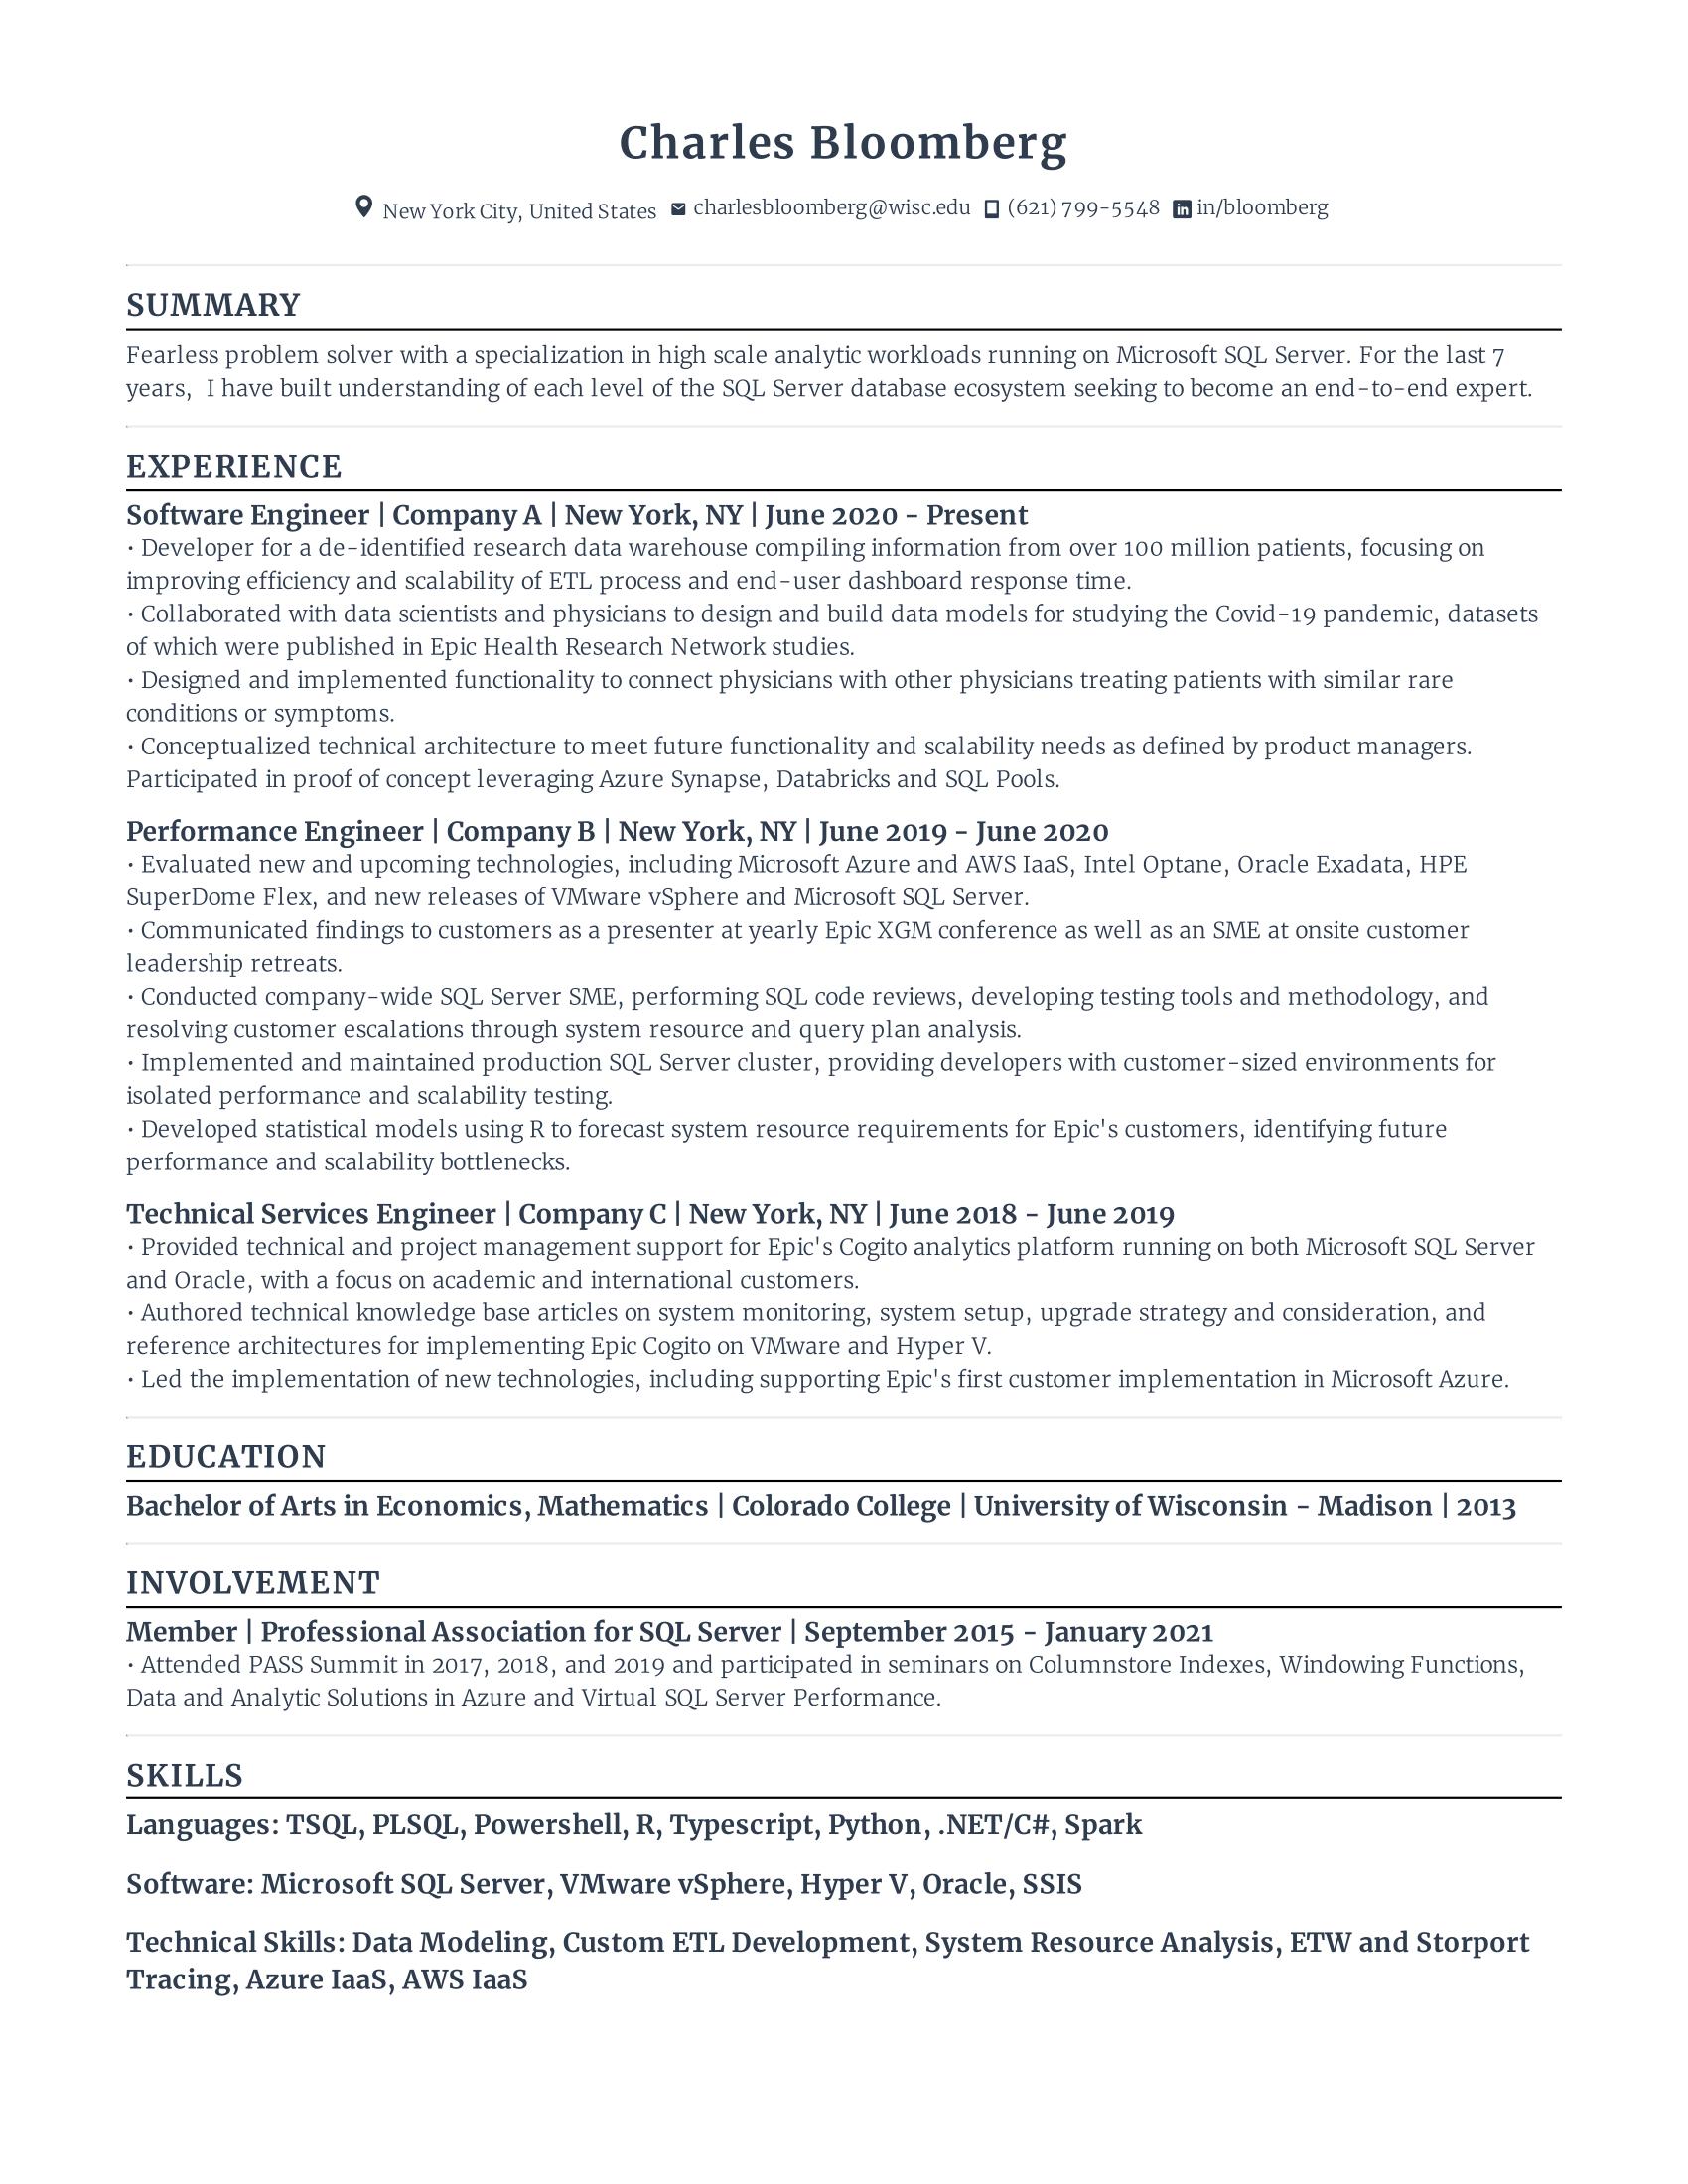 Resume Example From Rezi